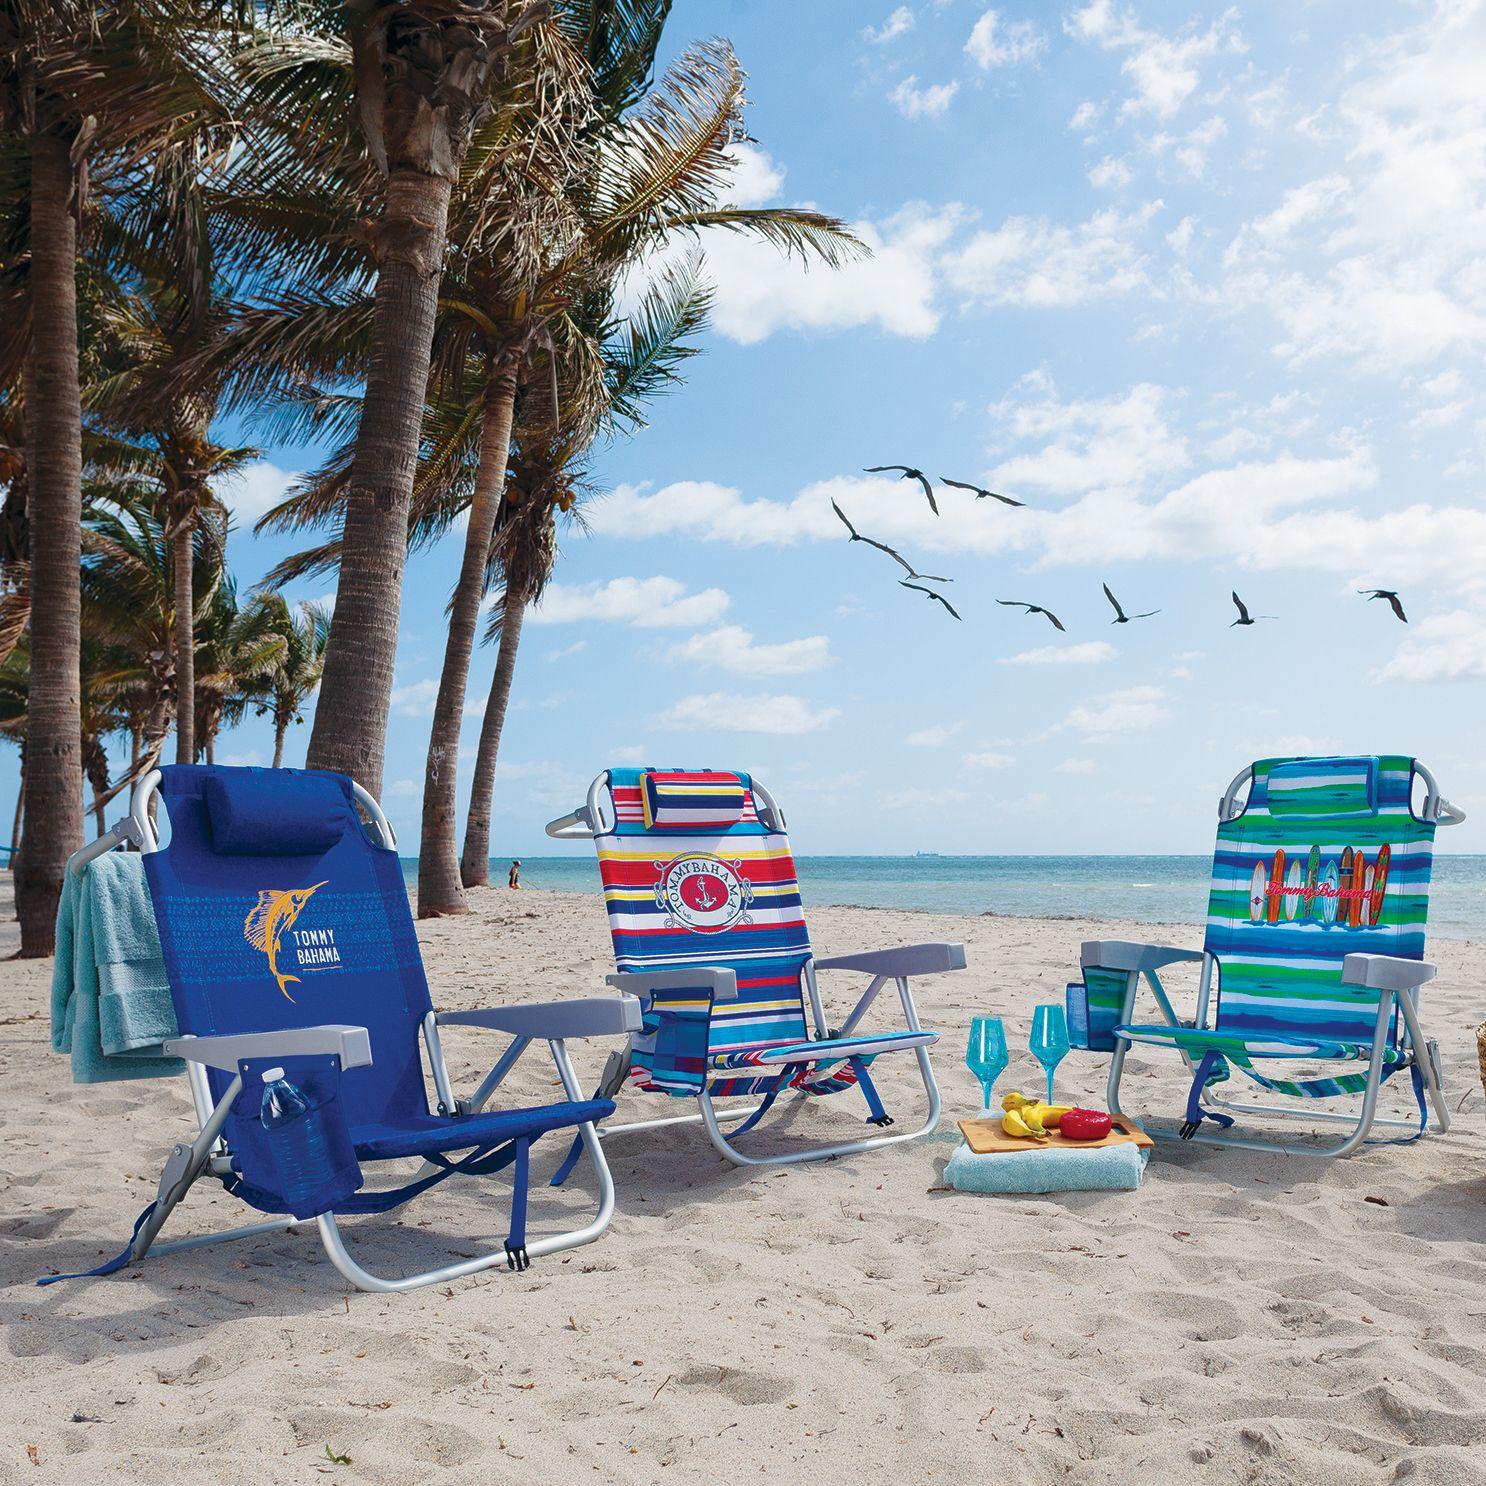 tommy bahama backpack beach